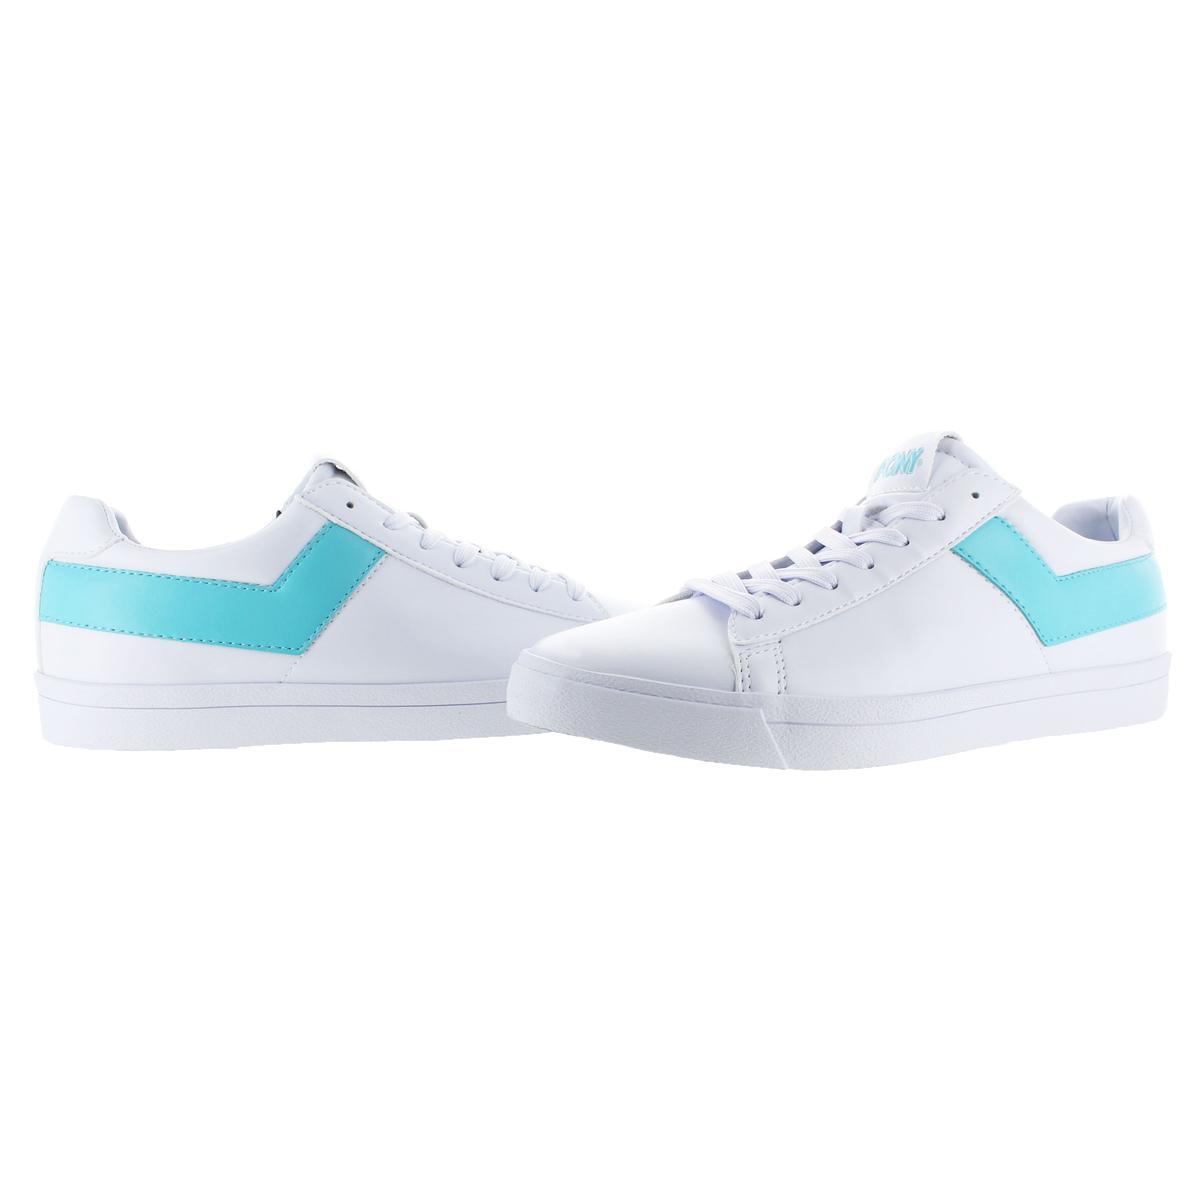 Pony-Top-Star-Core-Women-039-s-Retro-Fashion-Sneaker-Shoes